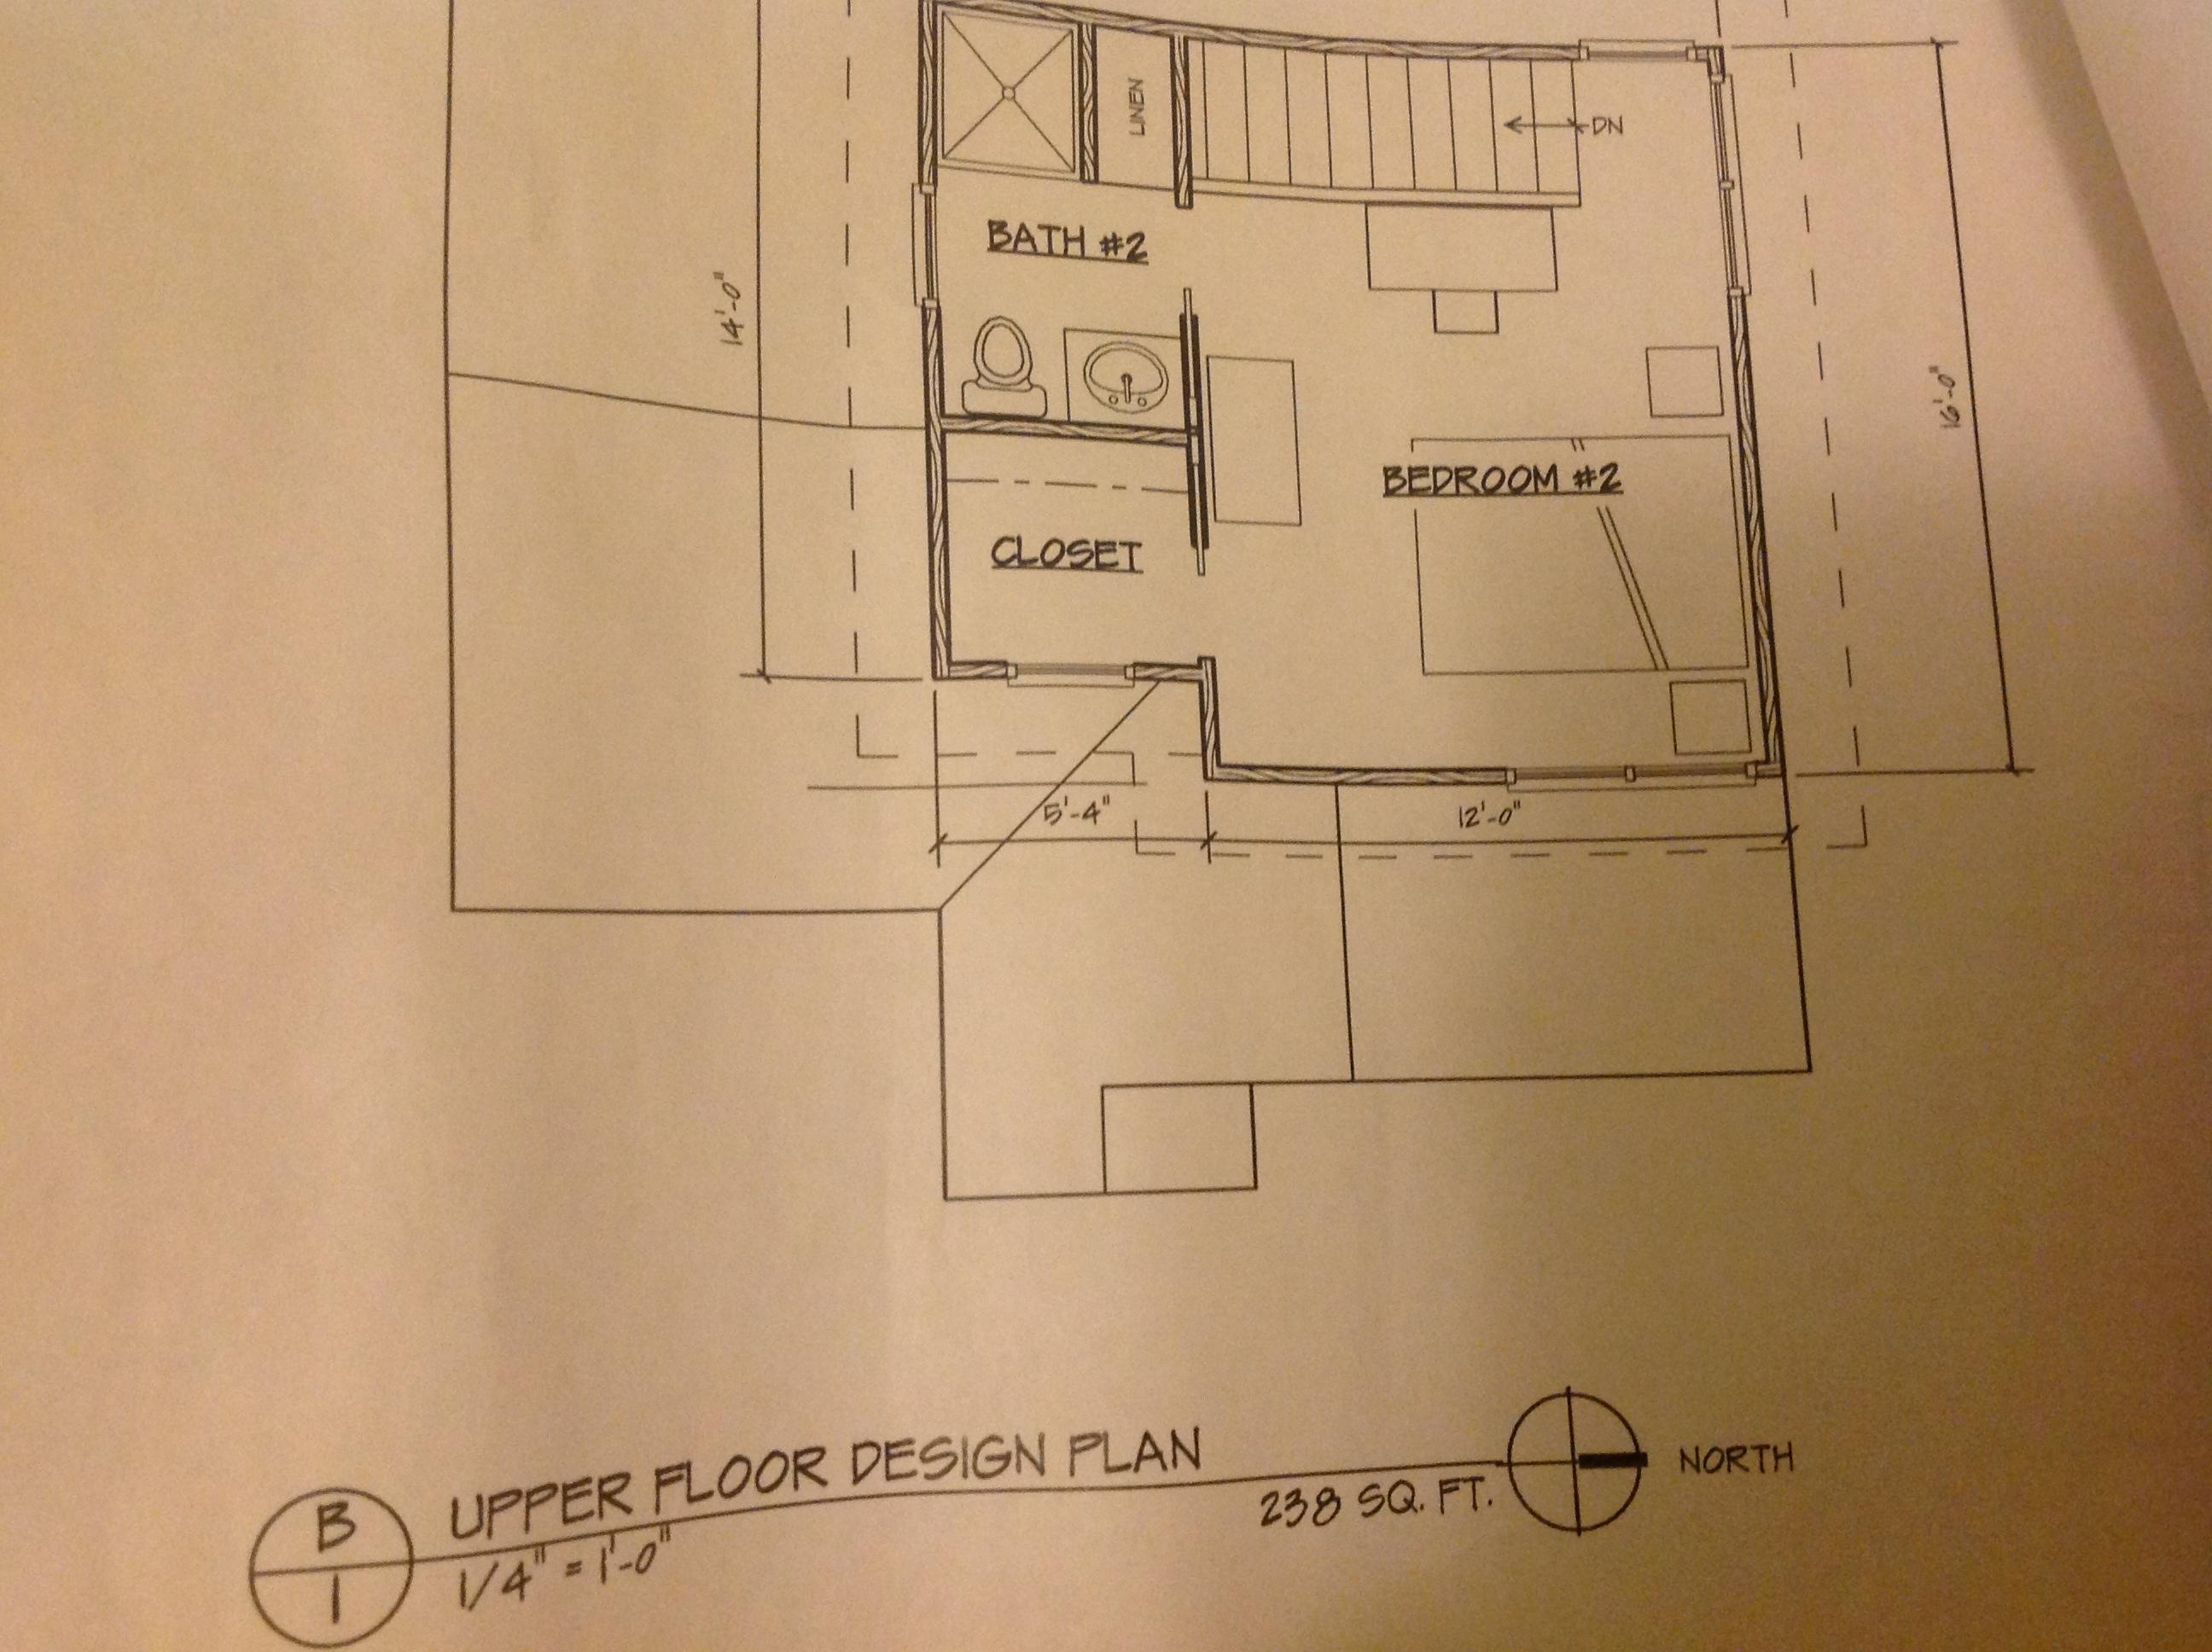 Scott powers adu second floor plan accessory dwellings for Adu floor plans